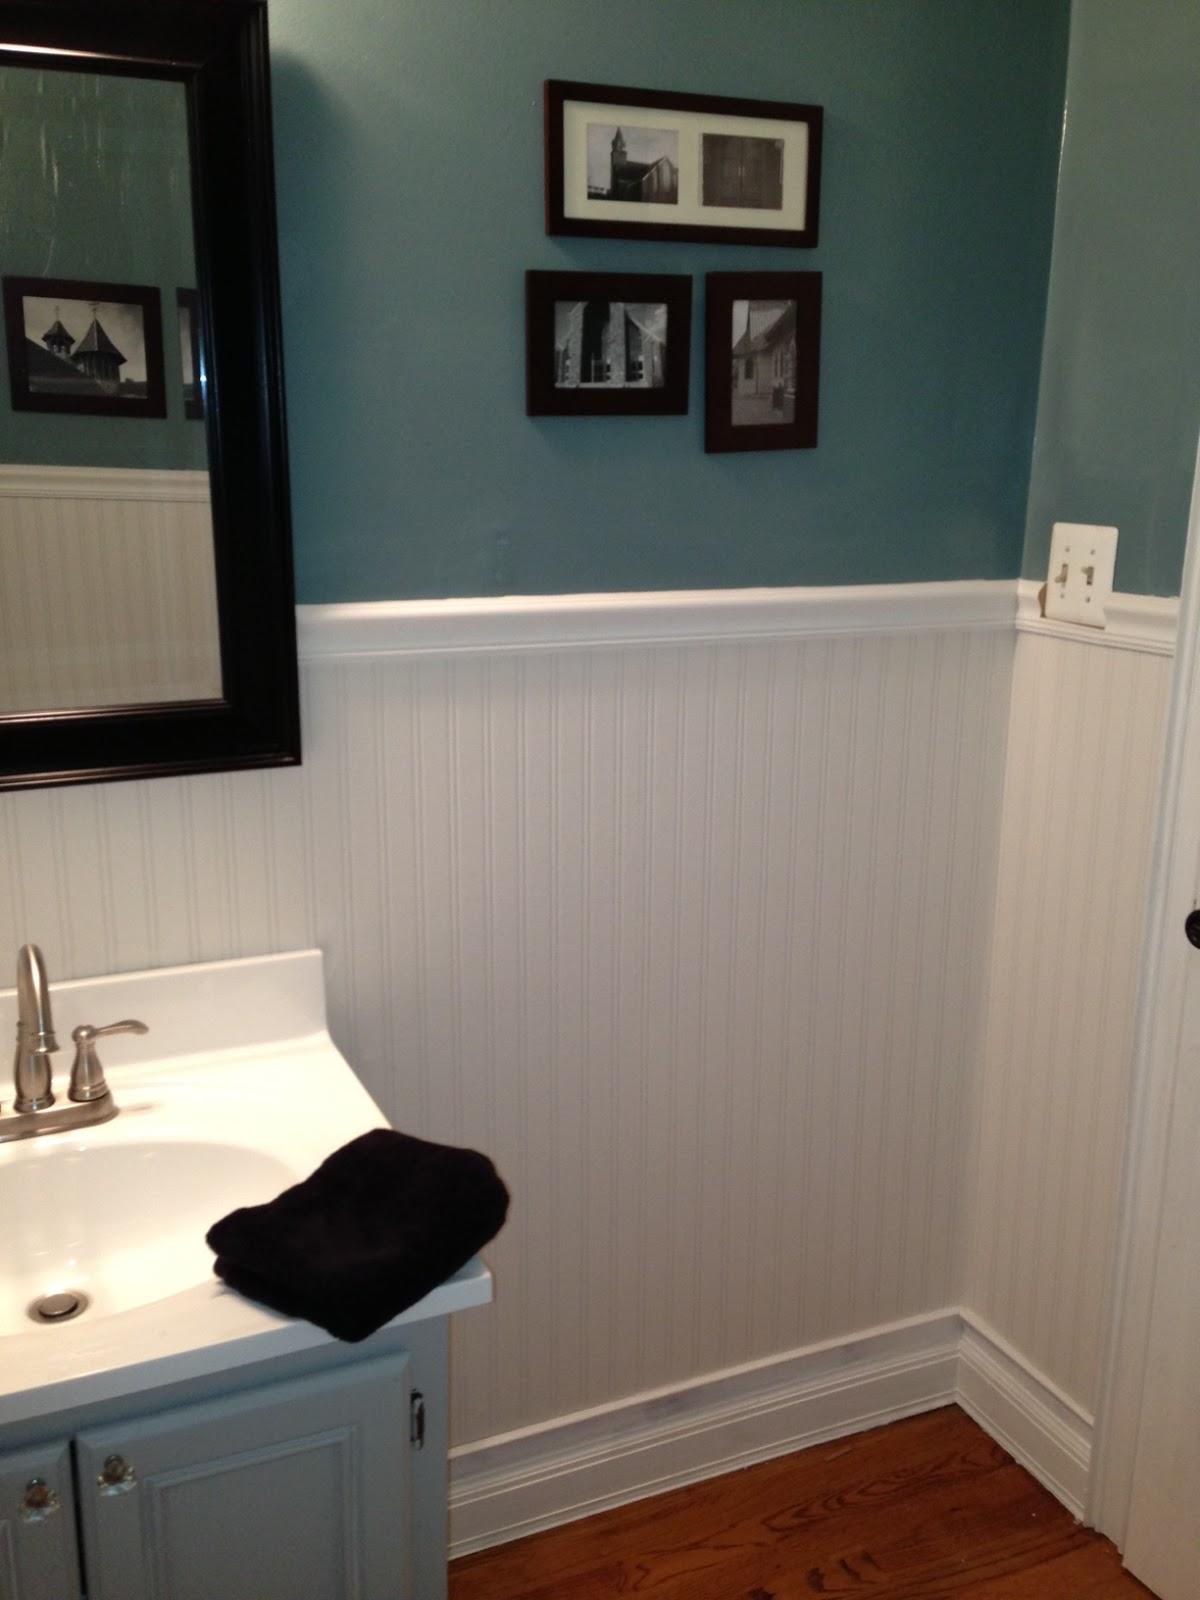 Little Brick Home House Tour. Textured Wallpaper Bathroom